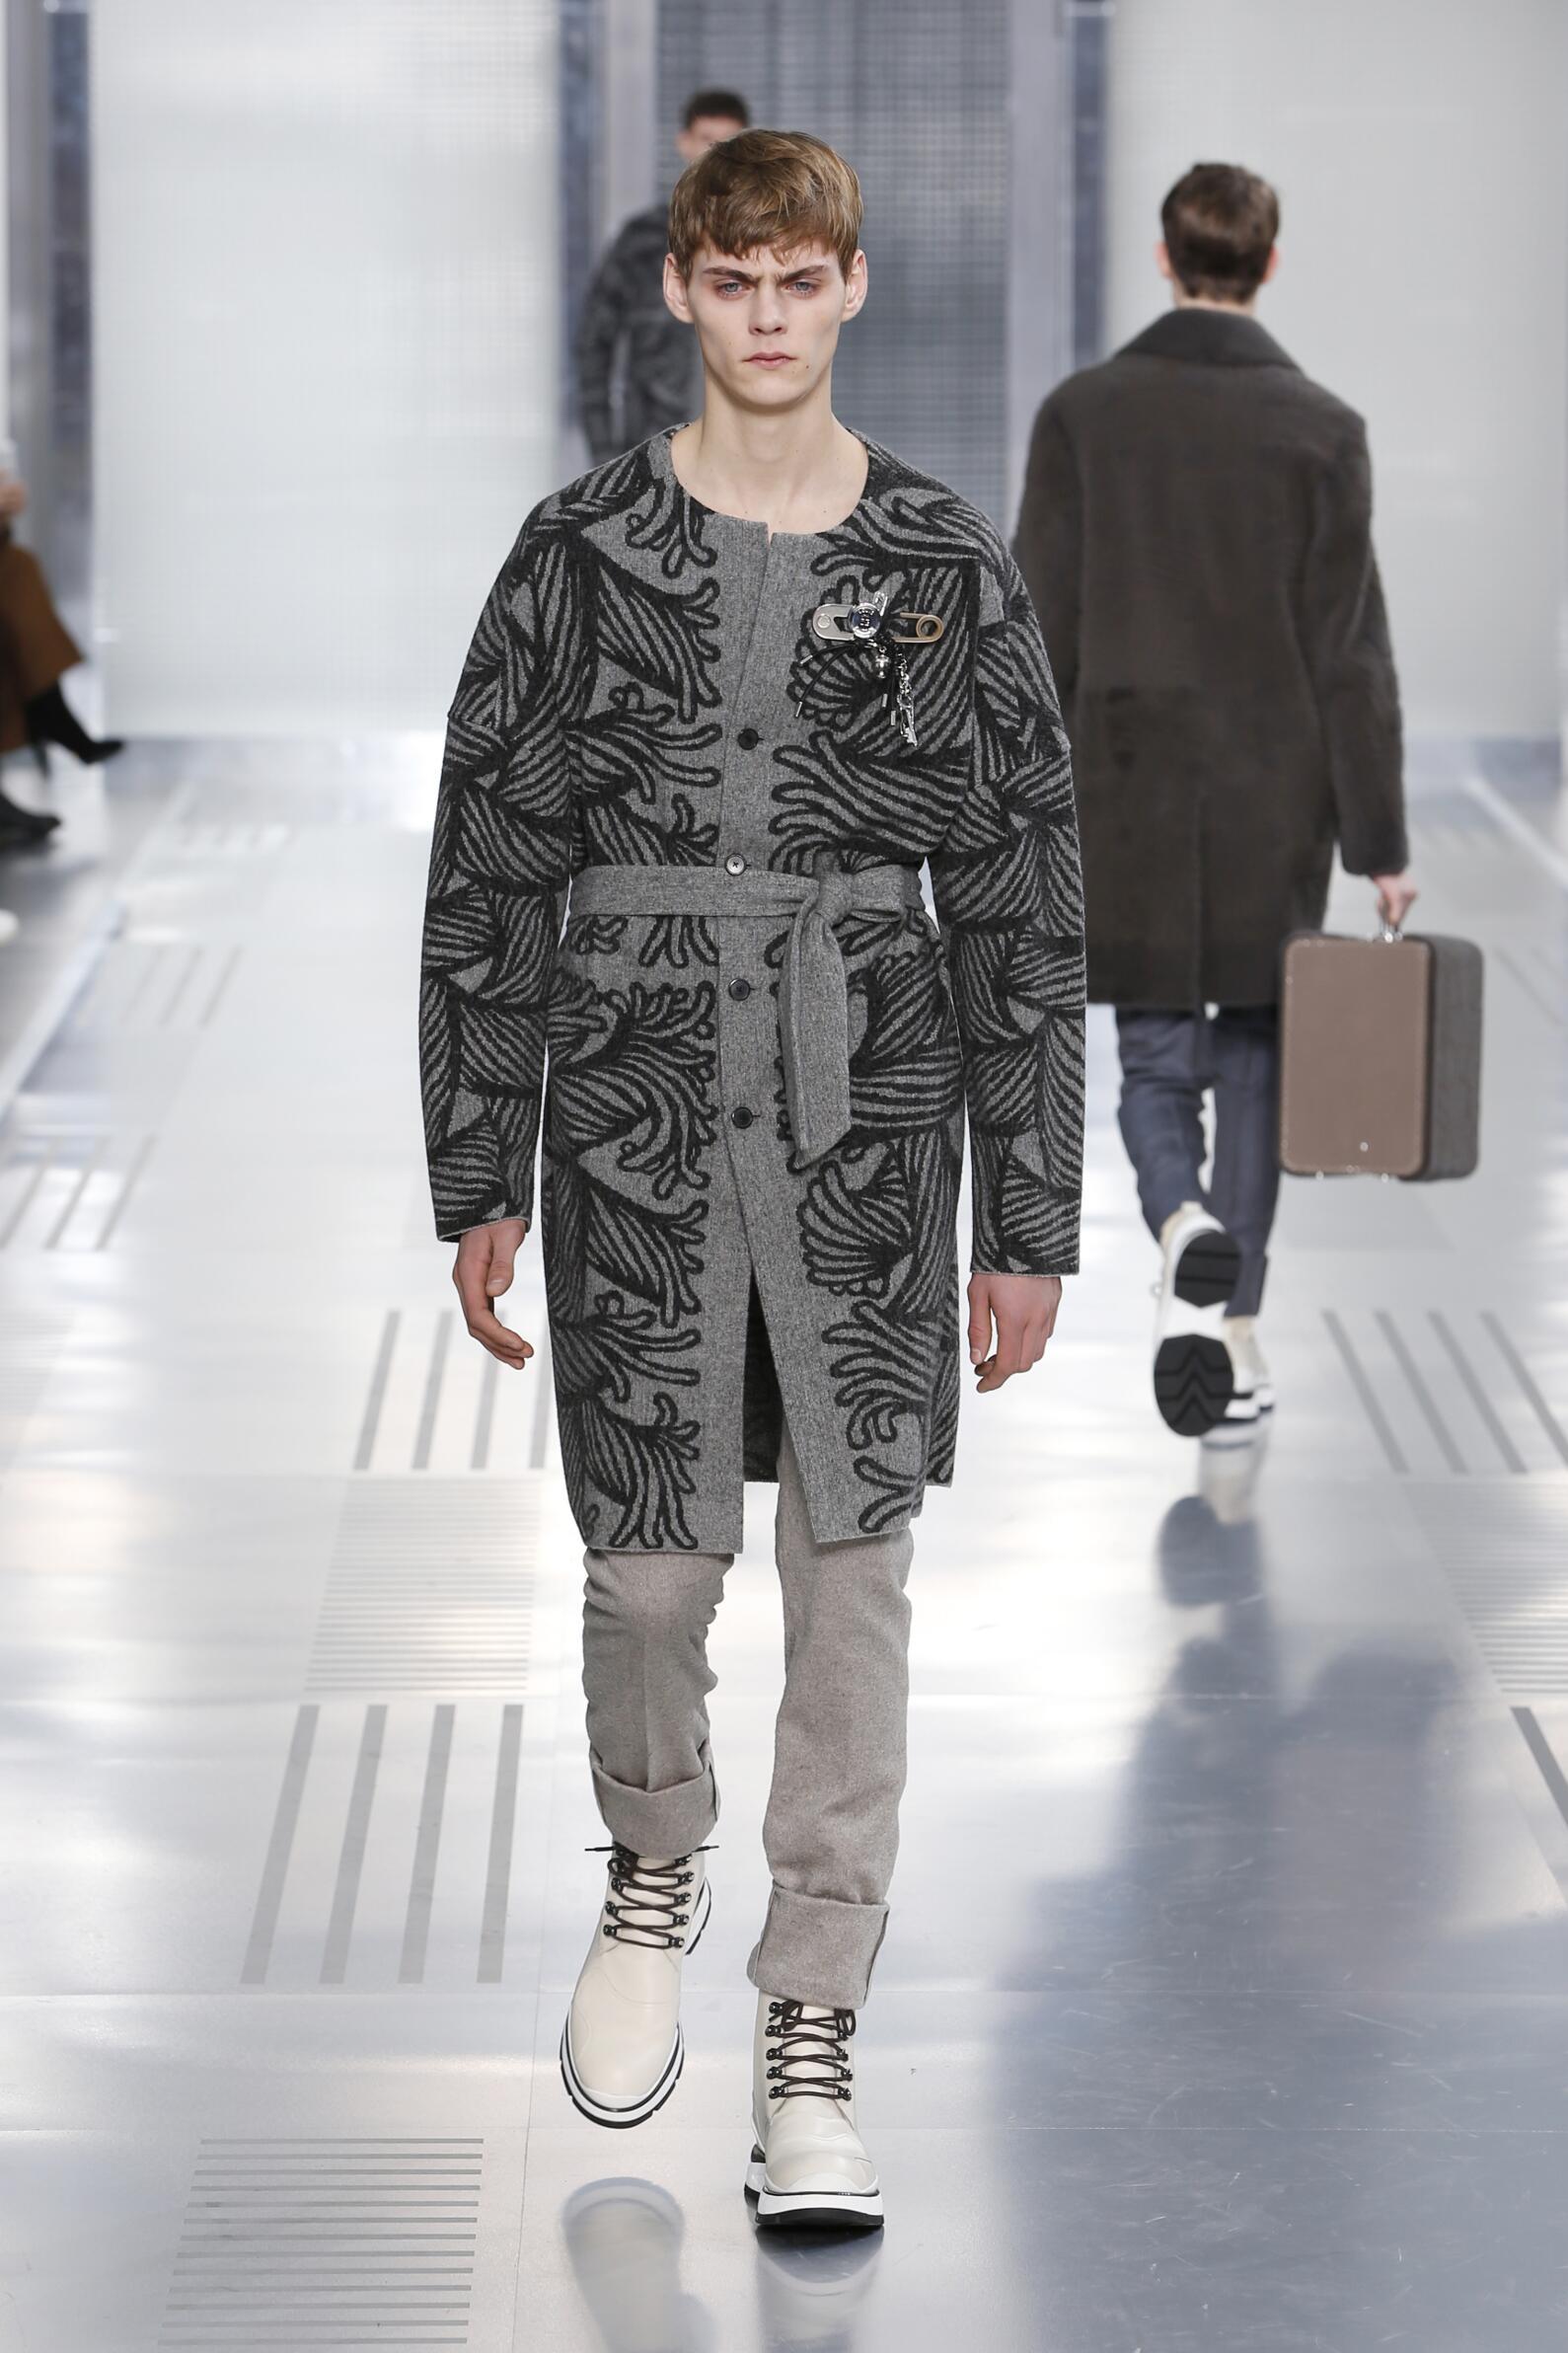 Louis Vuitton Men's Collection 2015 2016